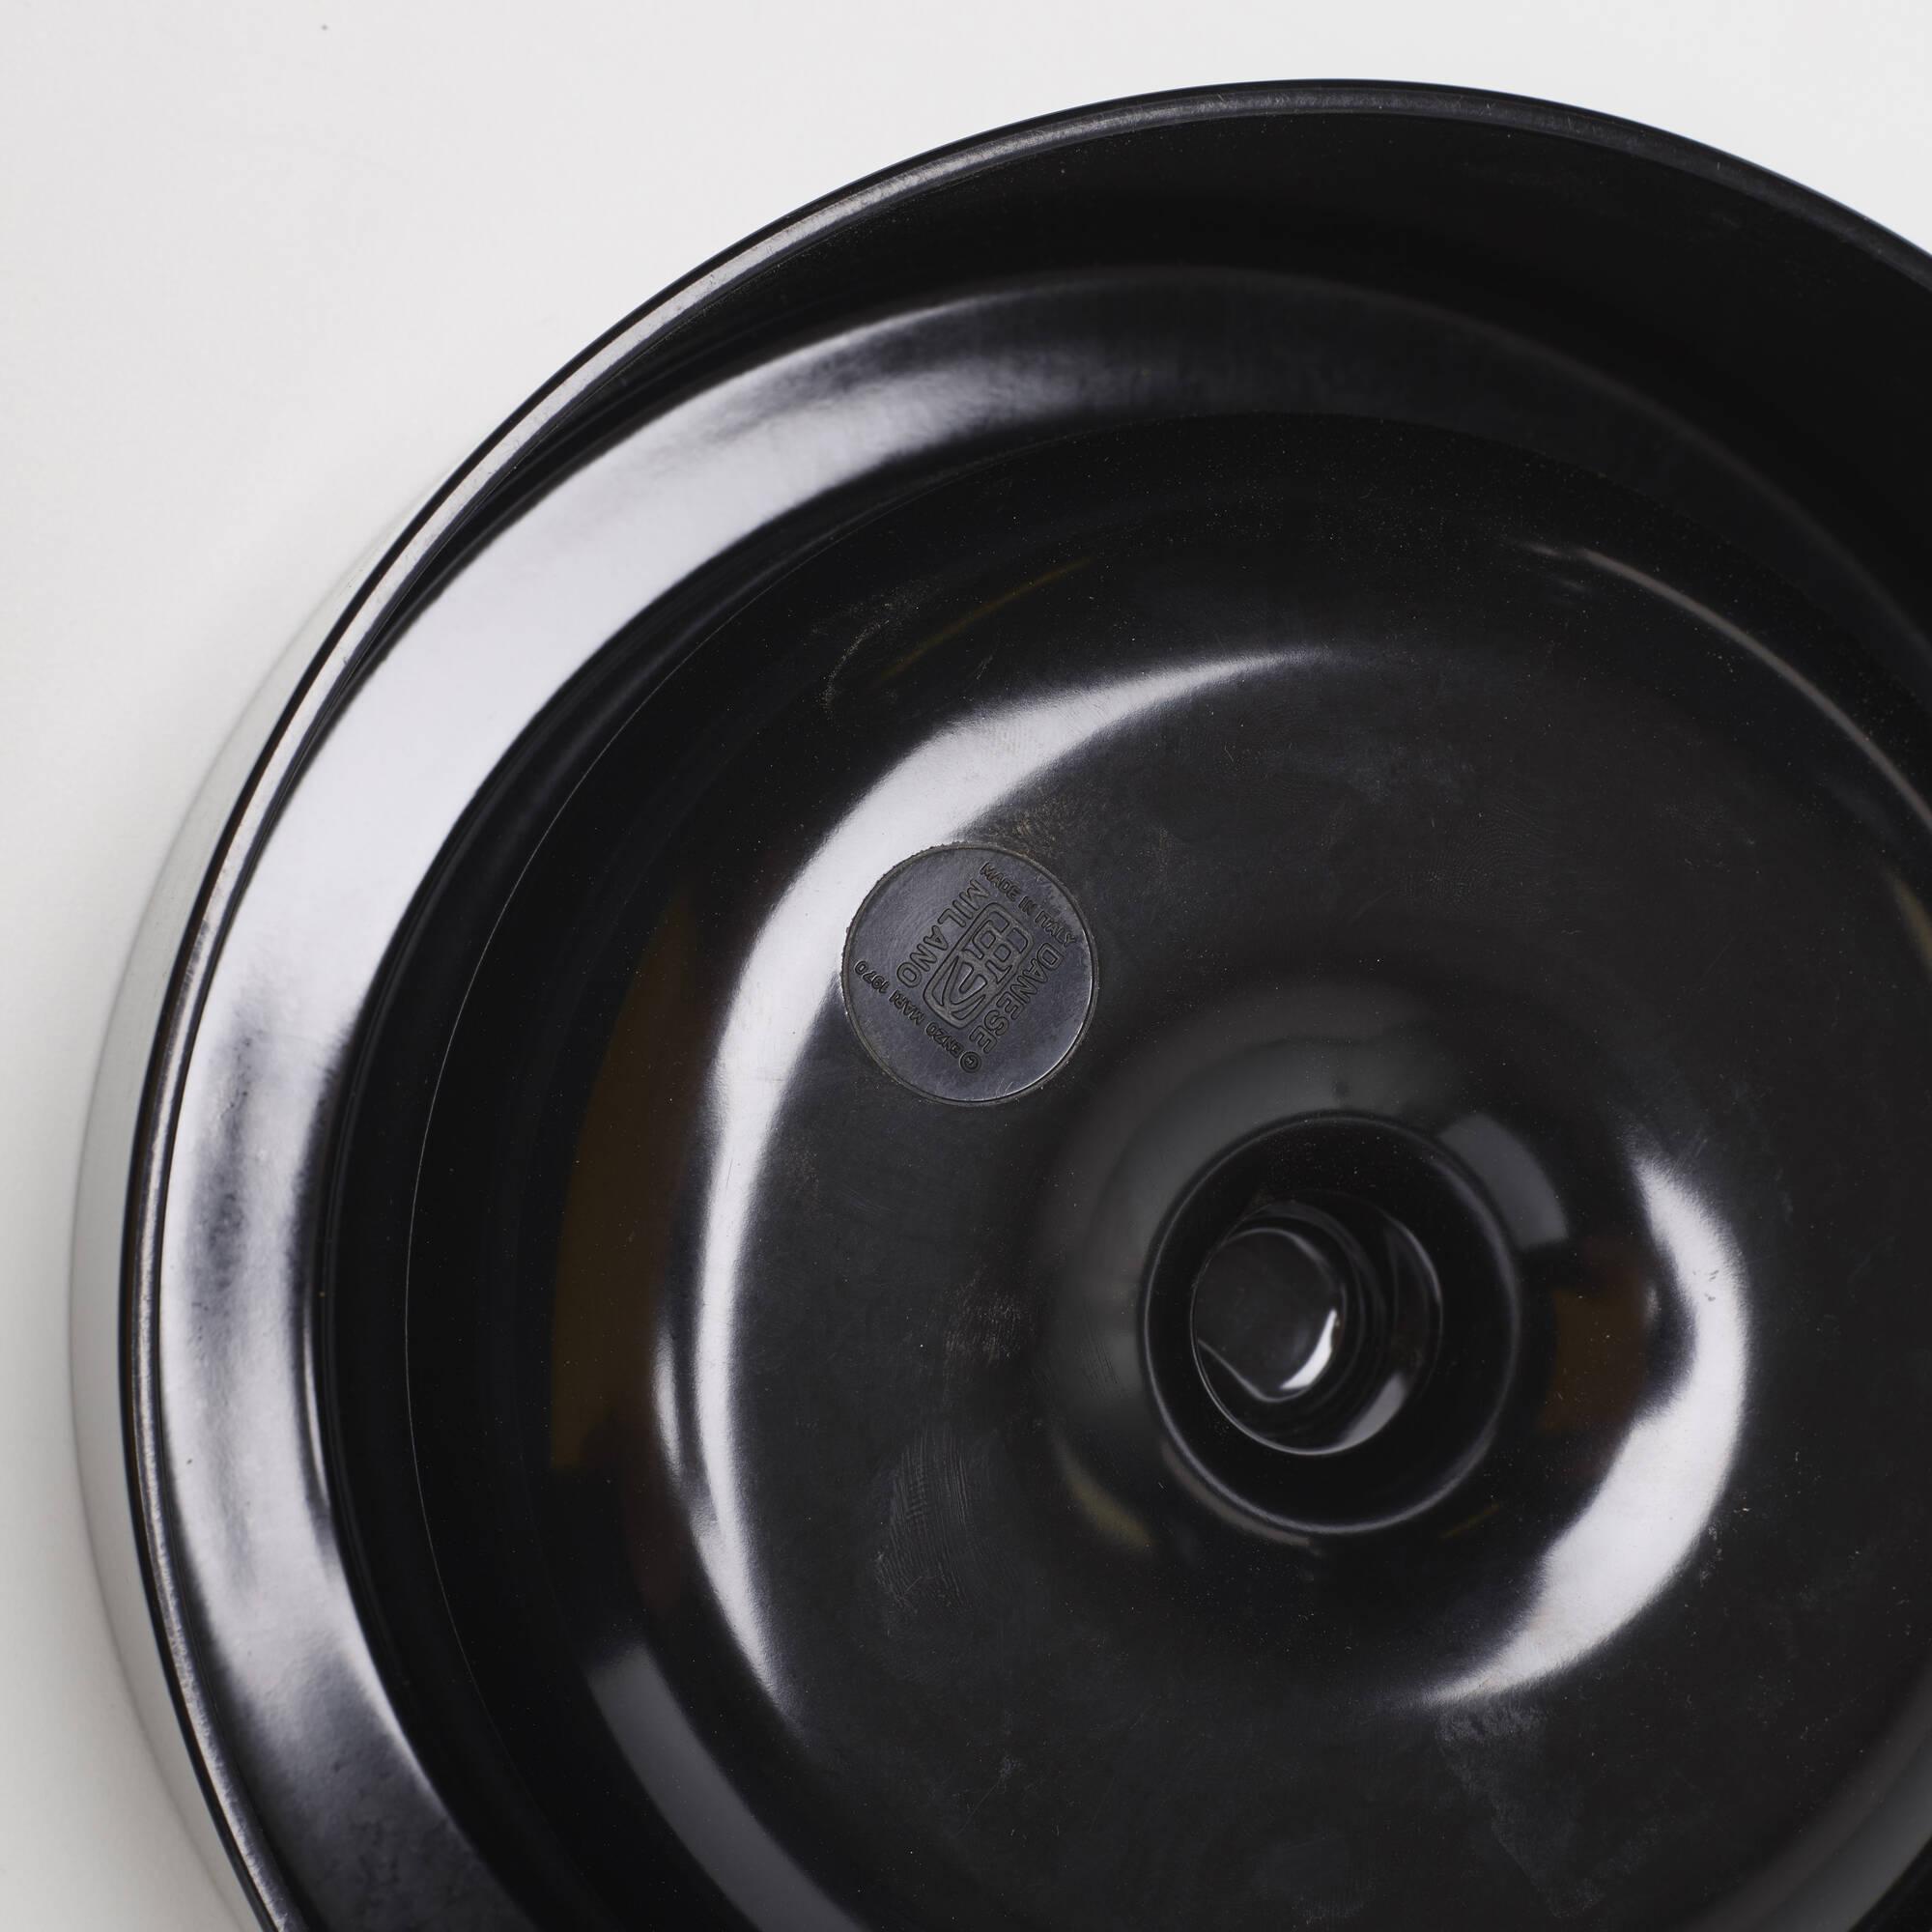 533: Enzo Mari / ashtrays, pair (3 of 3)